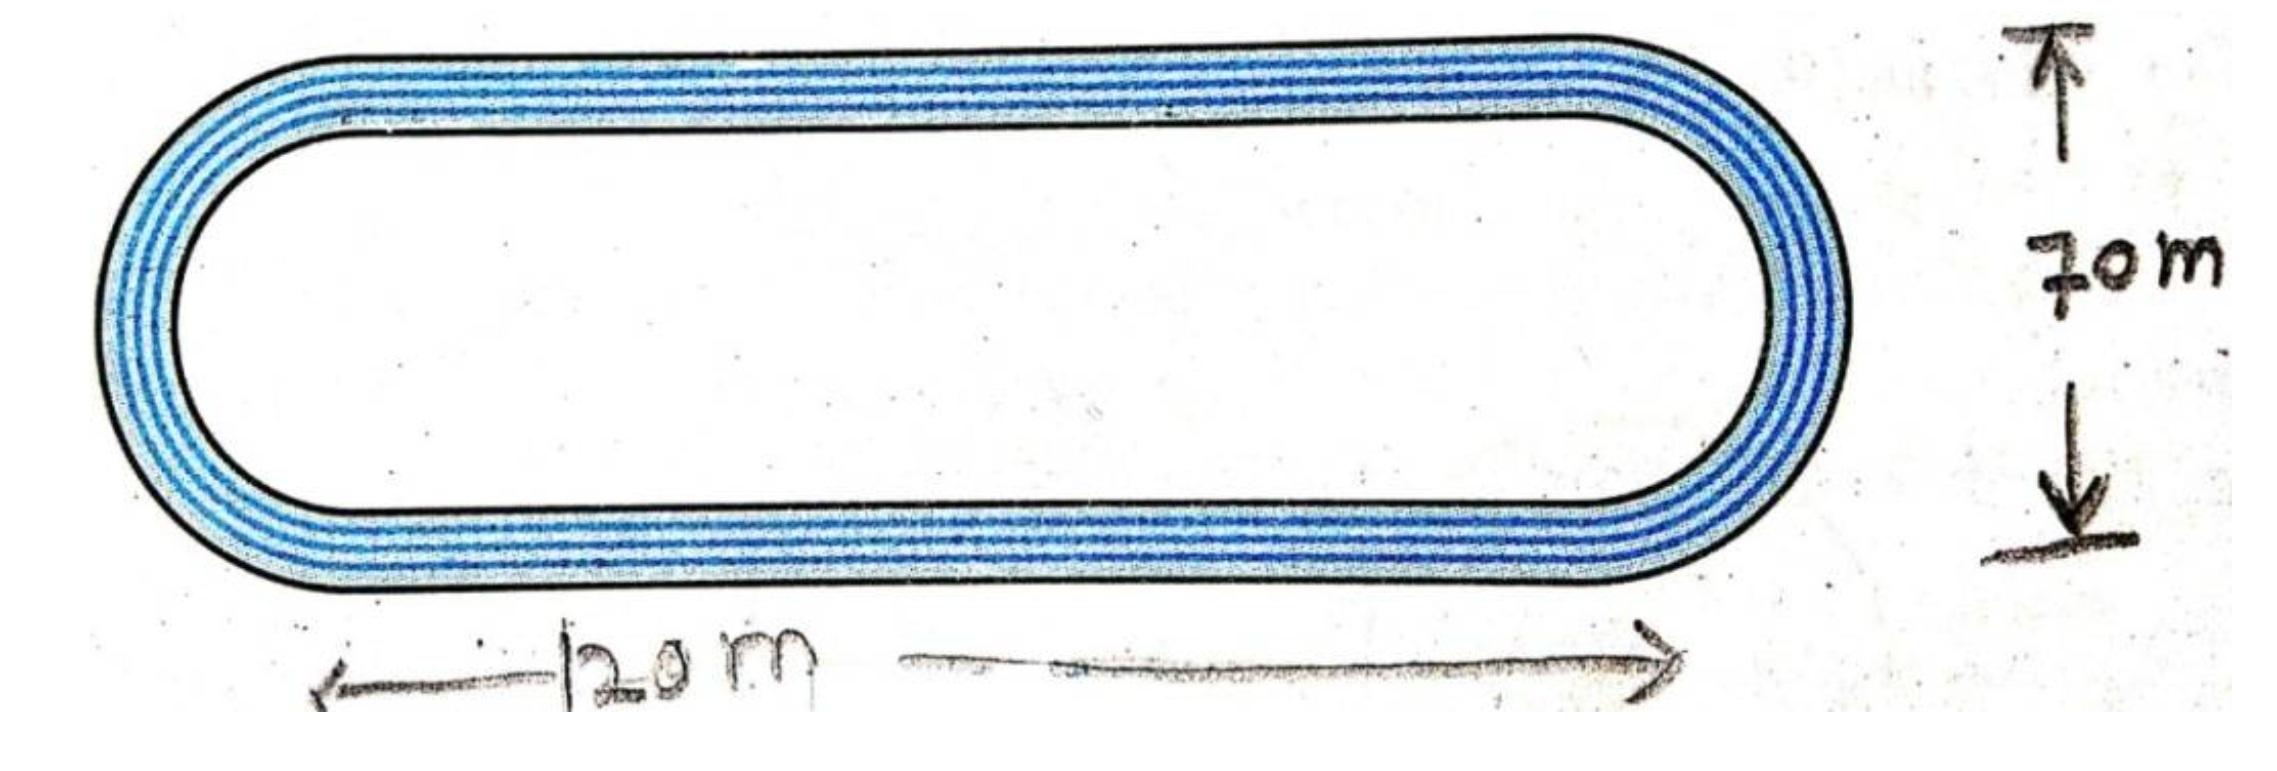 Q 29 - Sample Paper.jpg